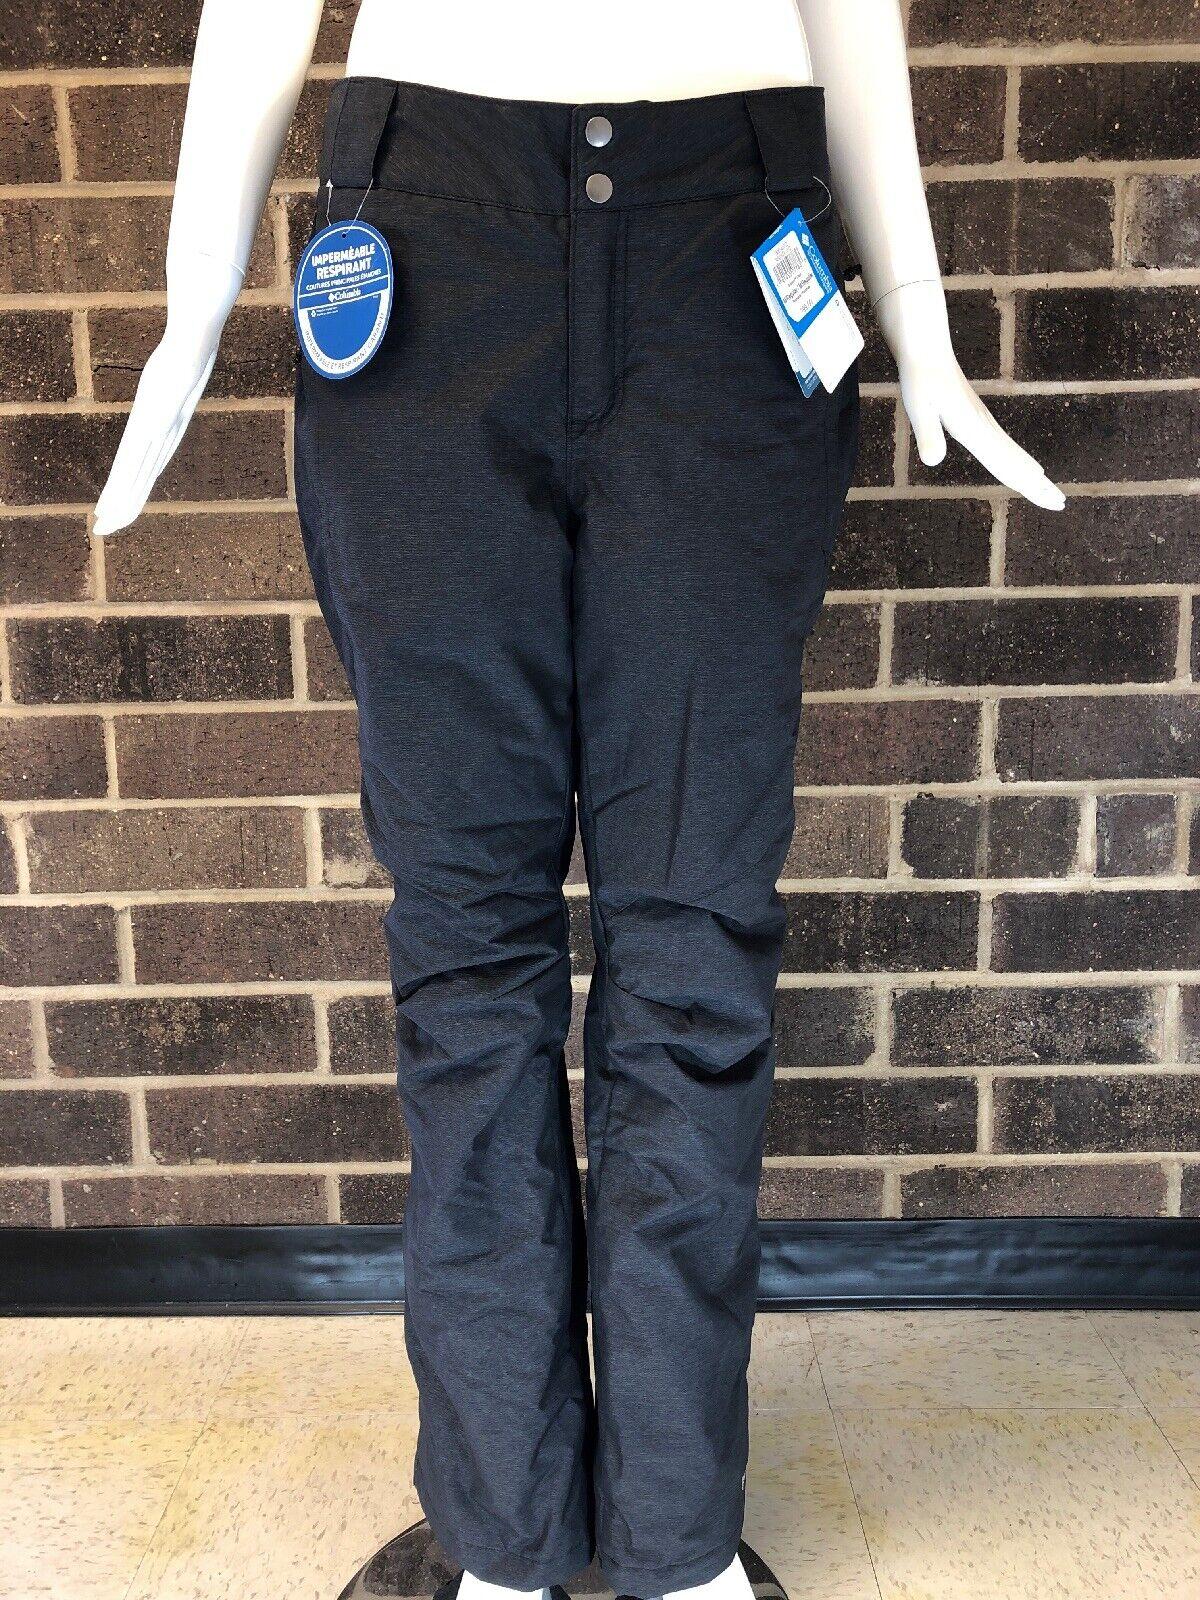 NEW Columbia Omni-Tech Bugaboo II Pants Womens  Medium Regular G  Size M  save up to 50%